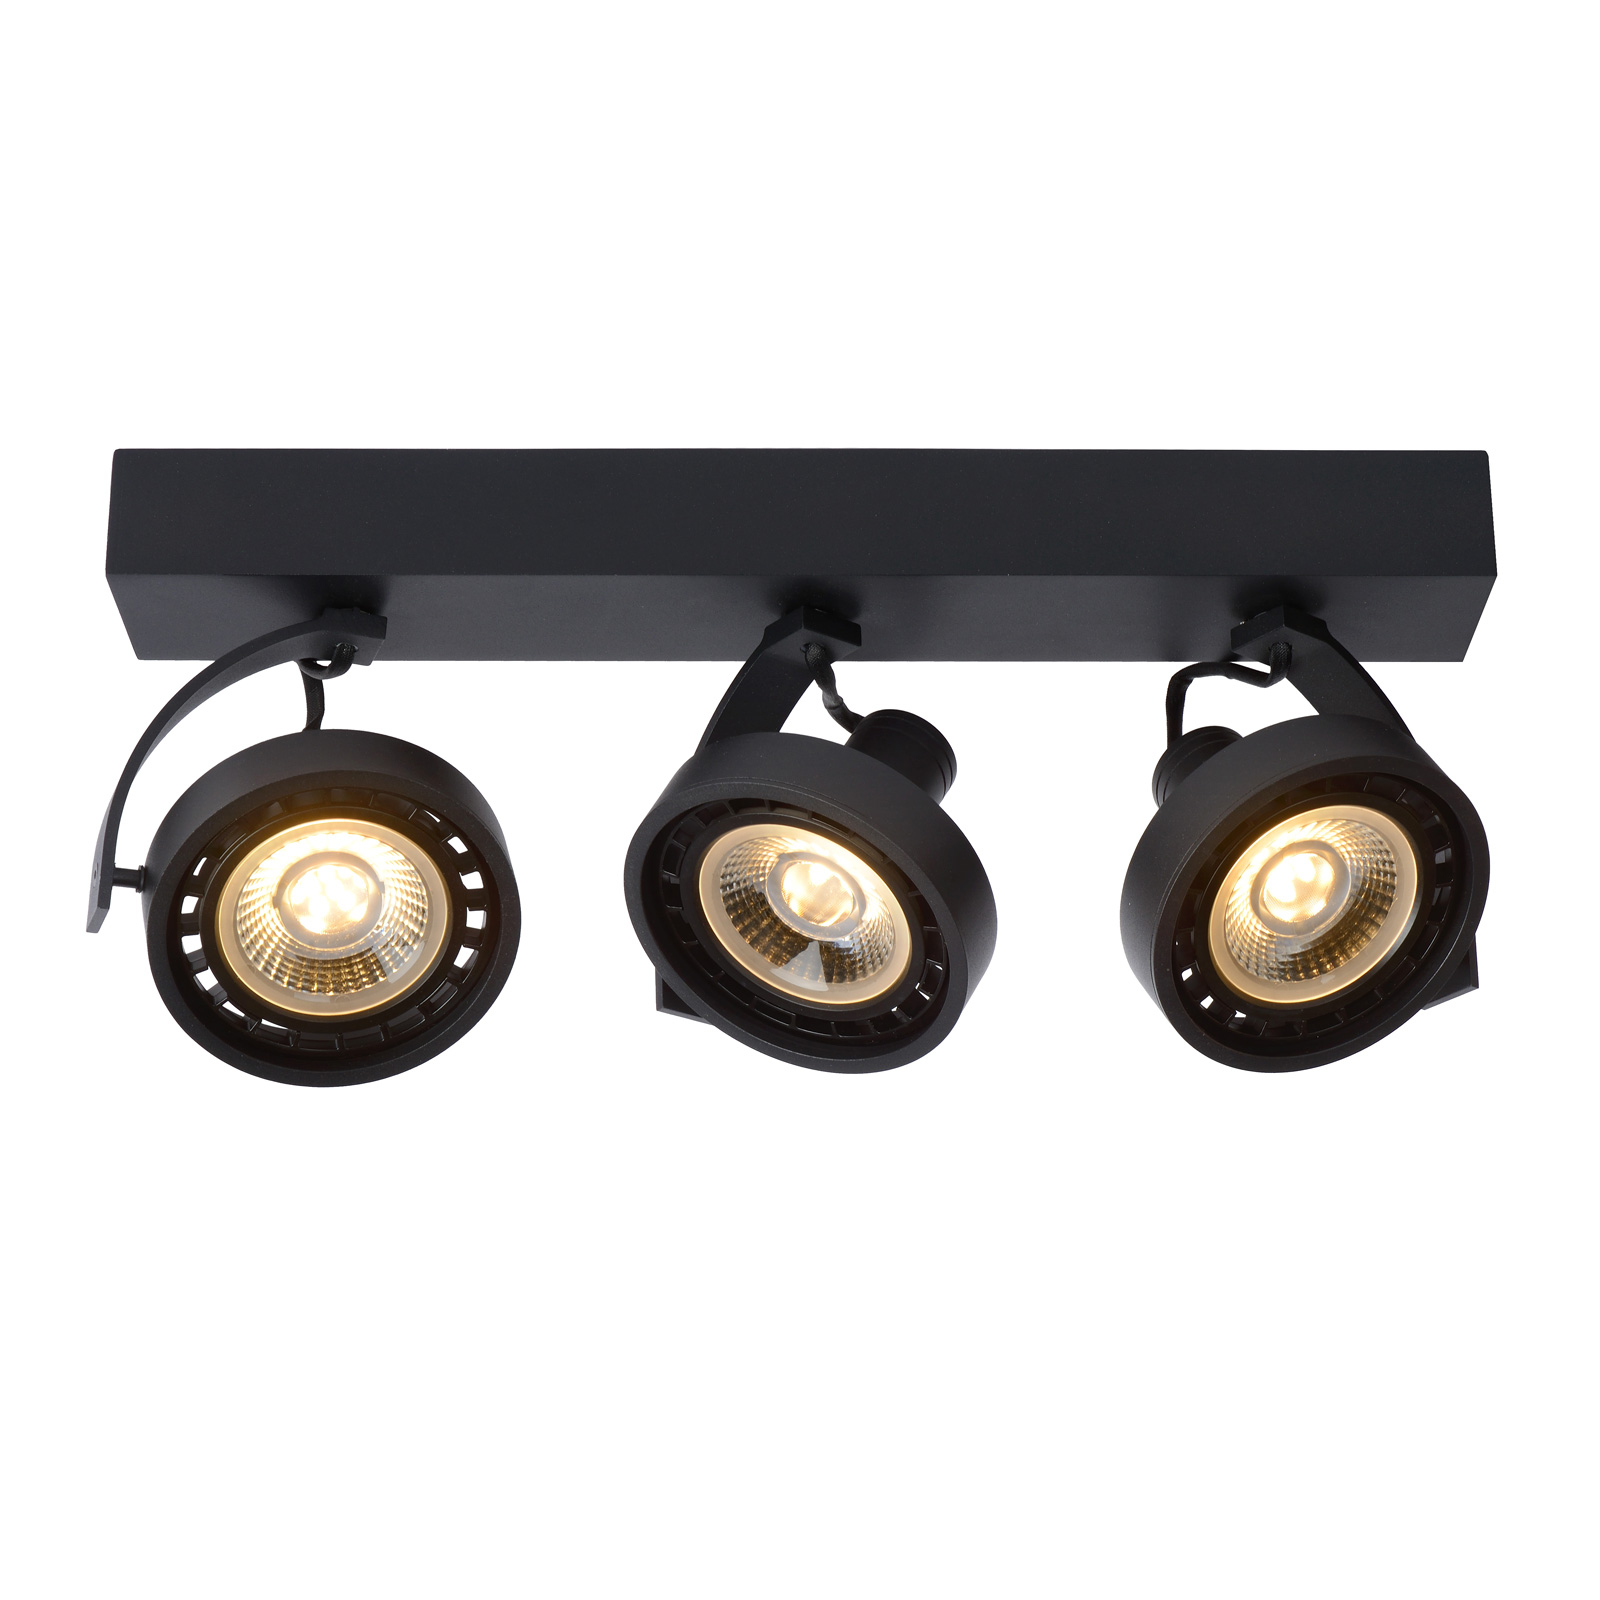 LED-kattokohdevalo Dorian 3-lamppuinen dim to warm